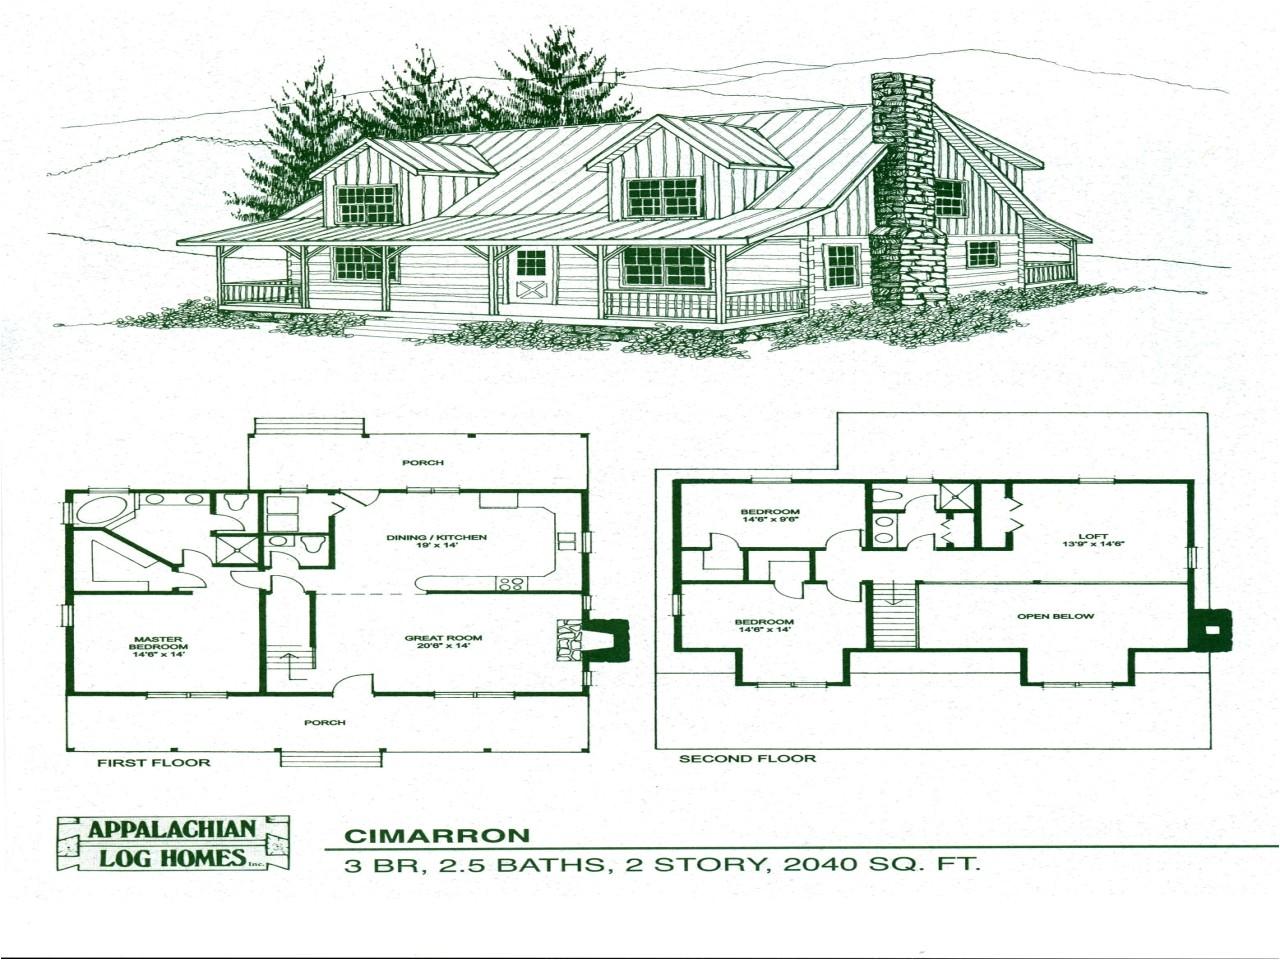 3487ca93ff428e3f log cabin kits 50 off log cabin kit homes floor plans amp